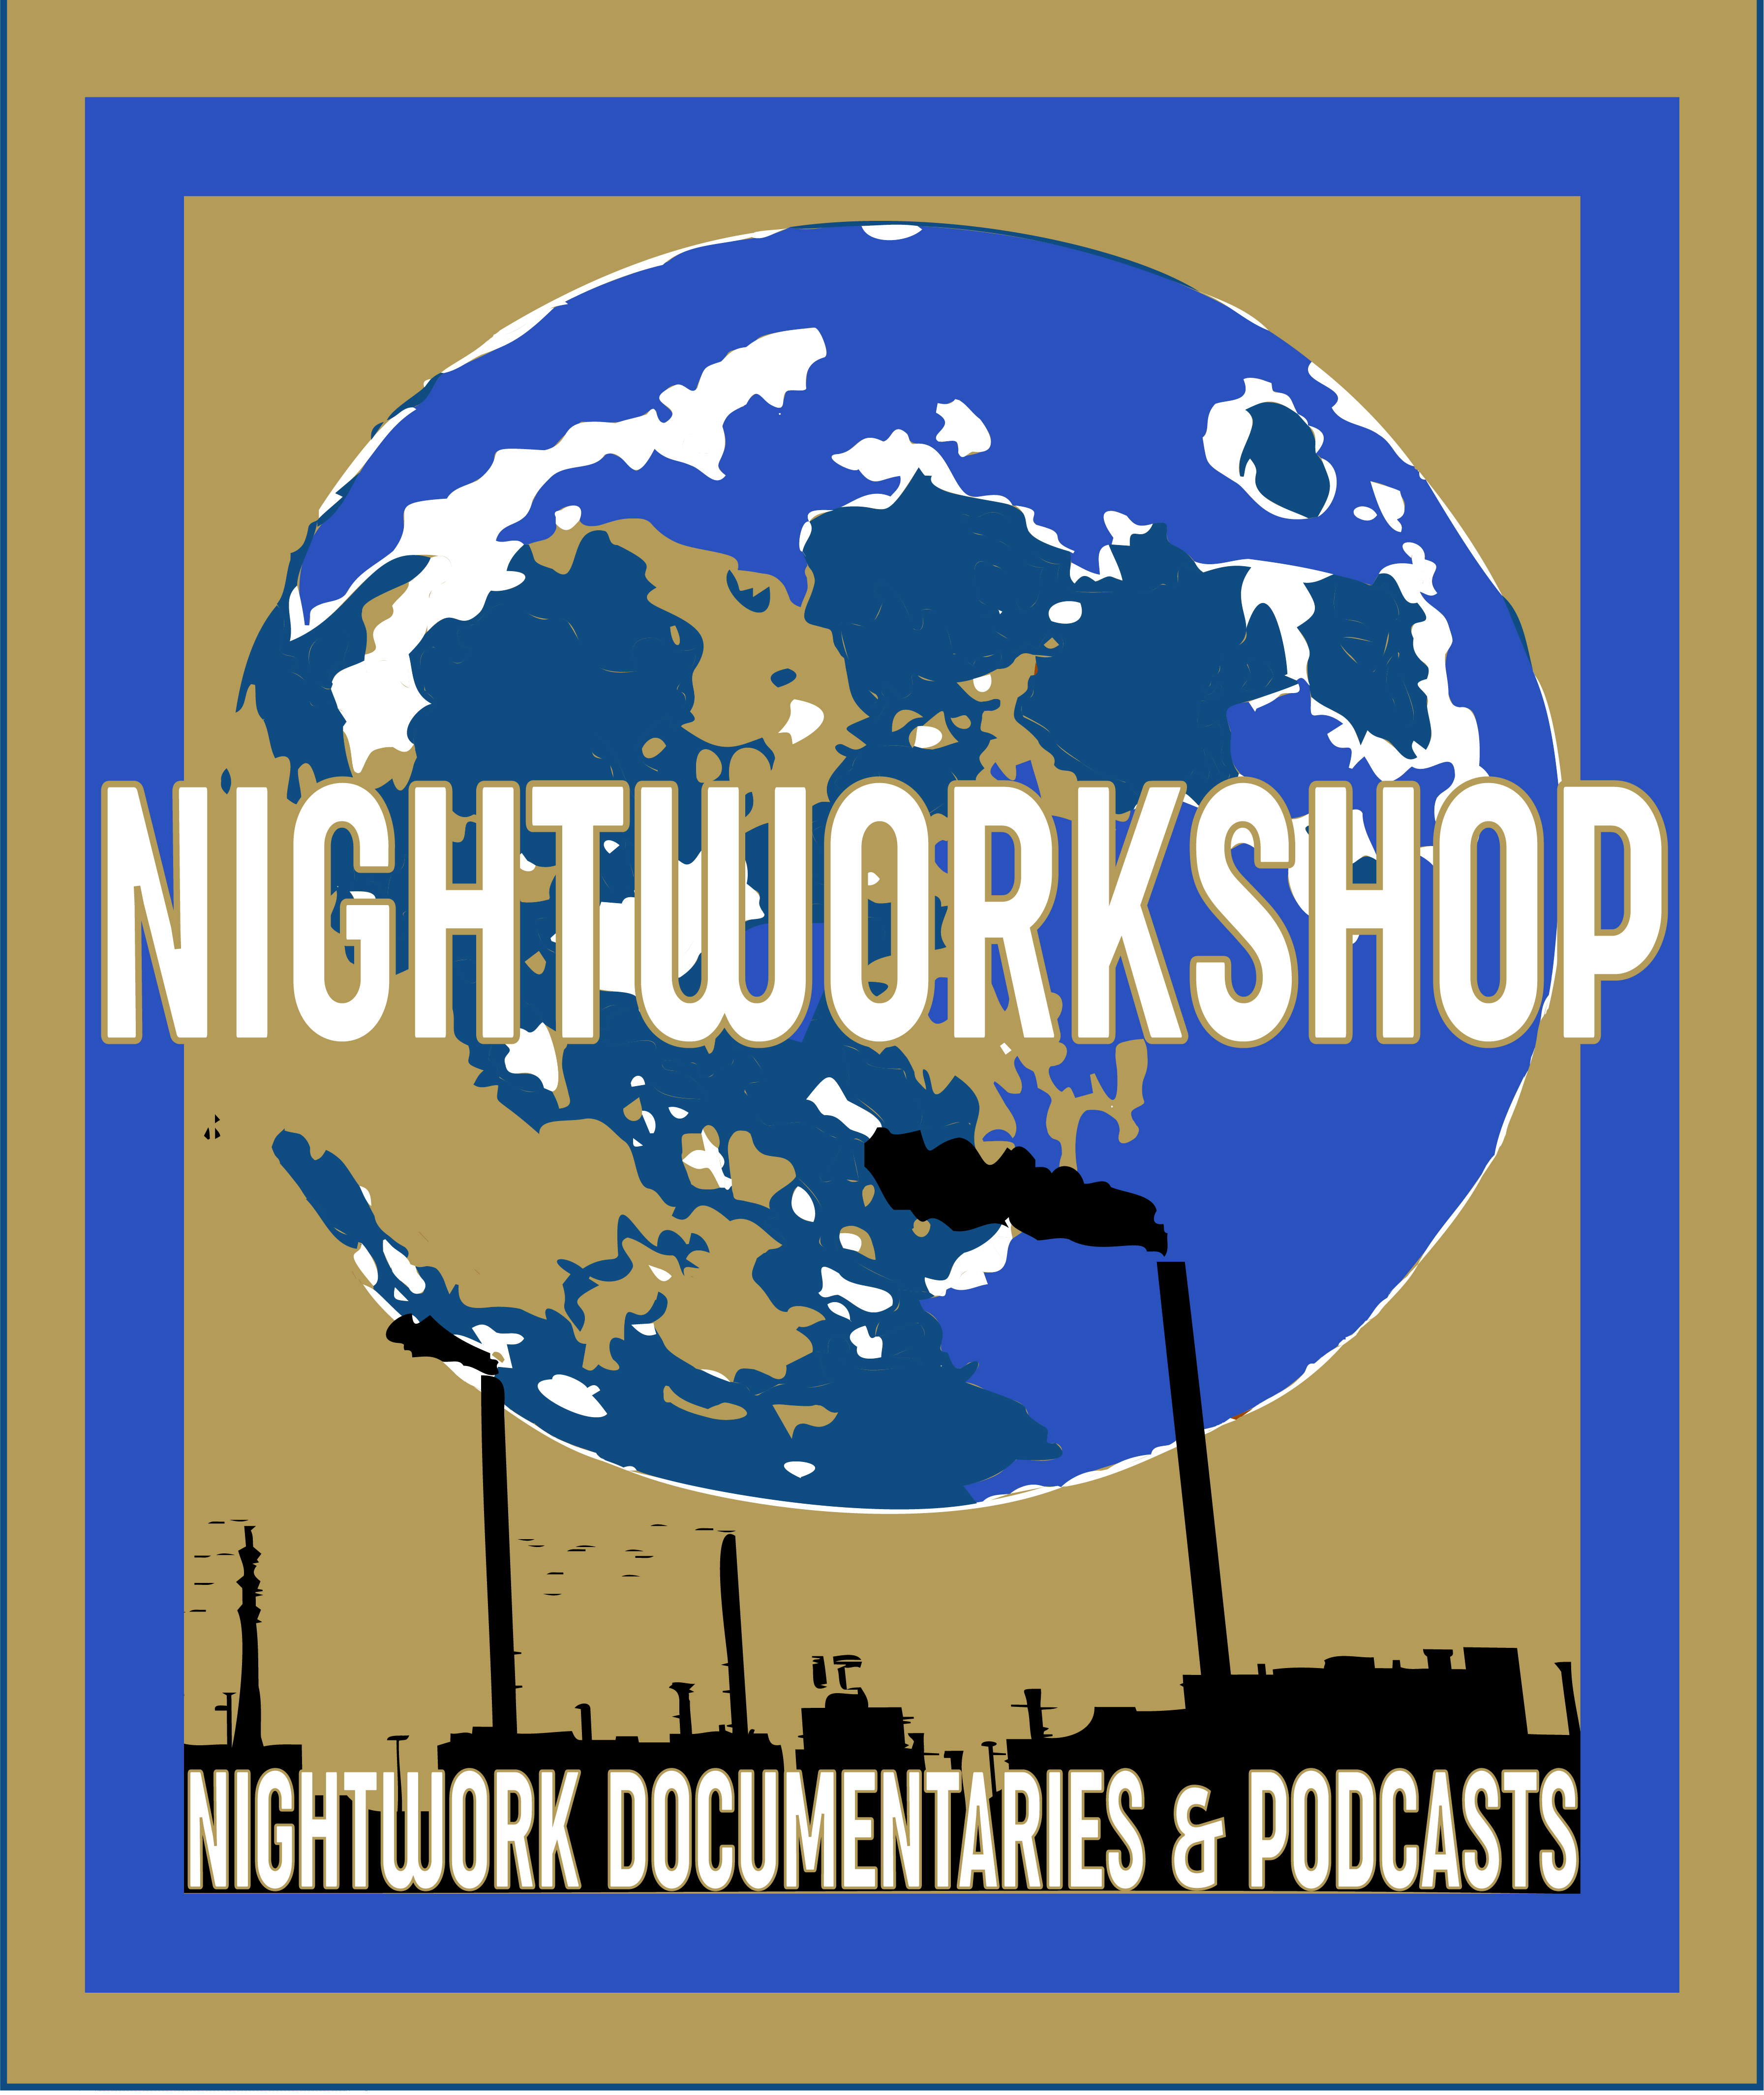 About Nightworkshop